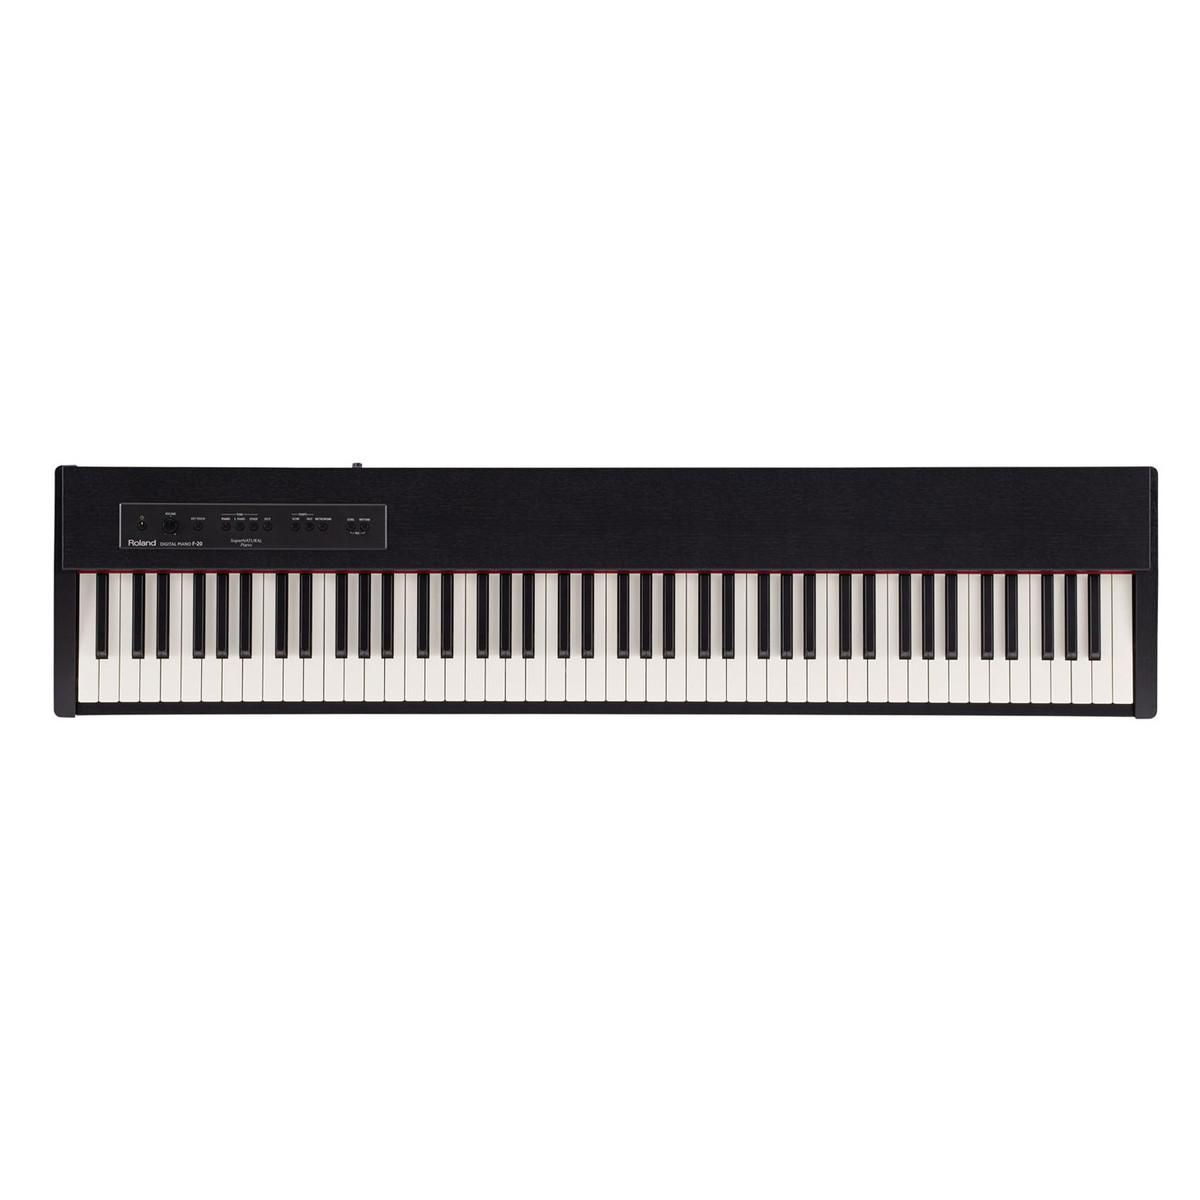 Image of Roland F-20 Portable Digital Piano Contemporary Black